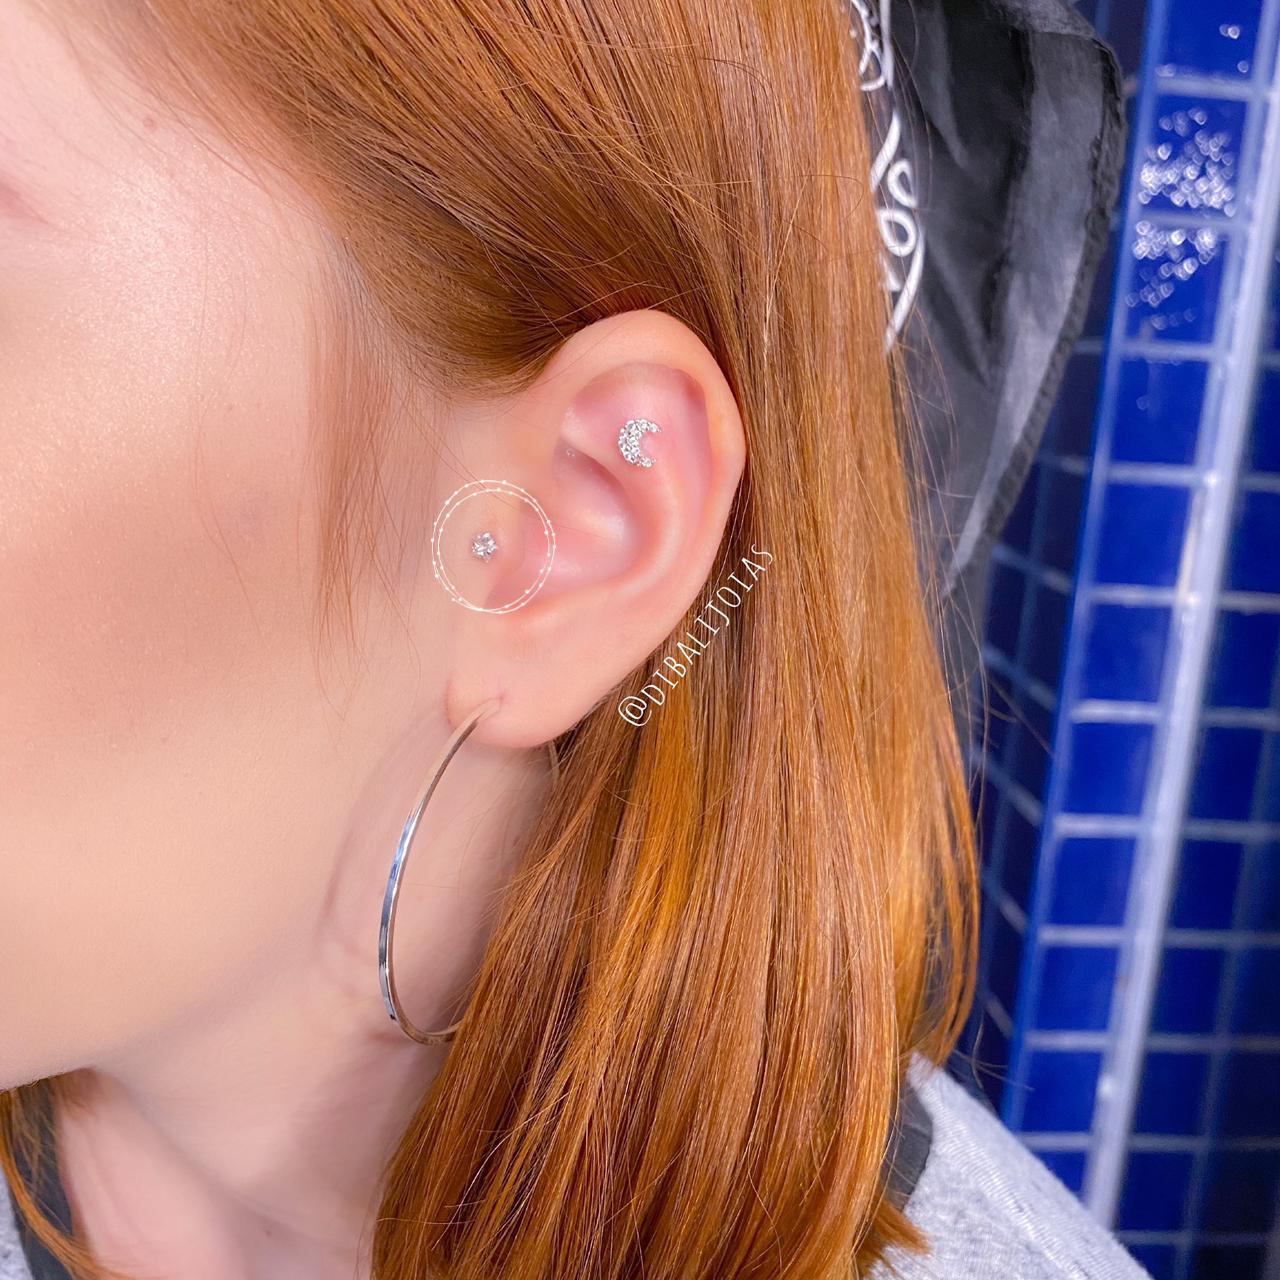 Piercing de Prata Orelha Tragus Estrela Pequena